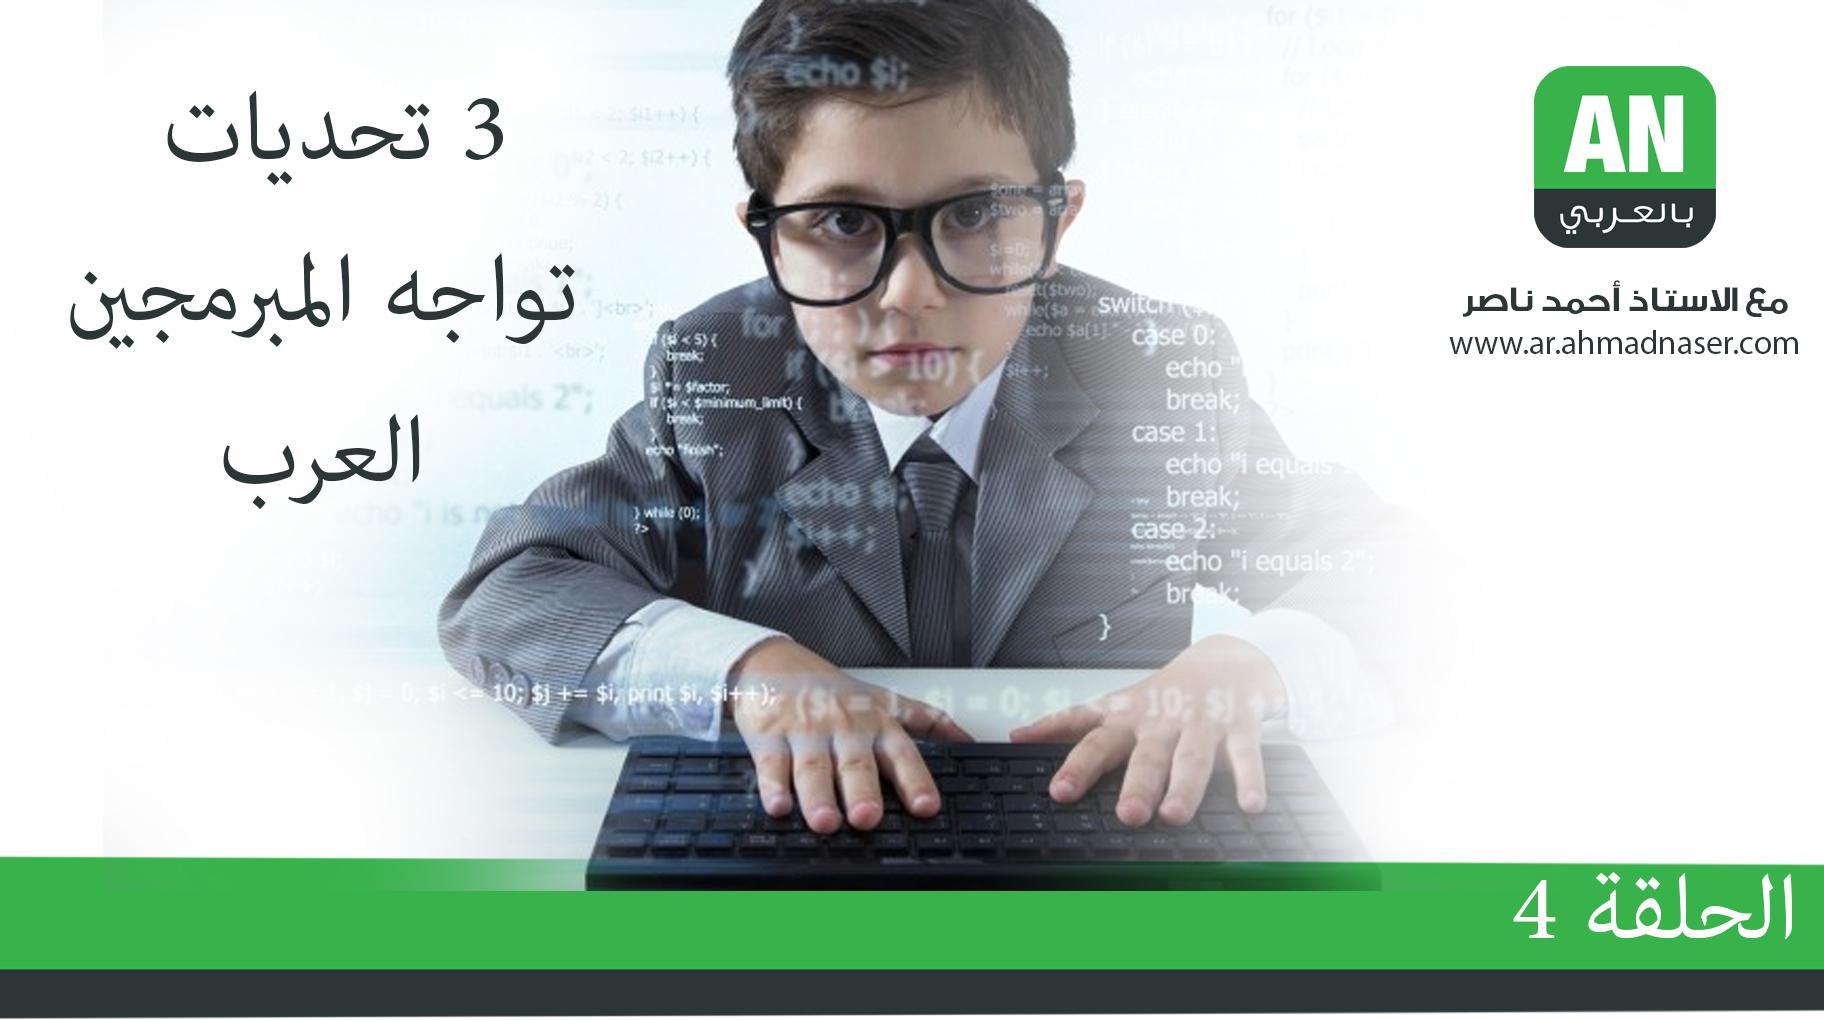 Photo of الحلقة الرابعة تحديات تواجه المبرمجين العرب